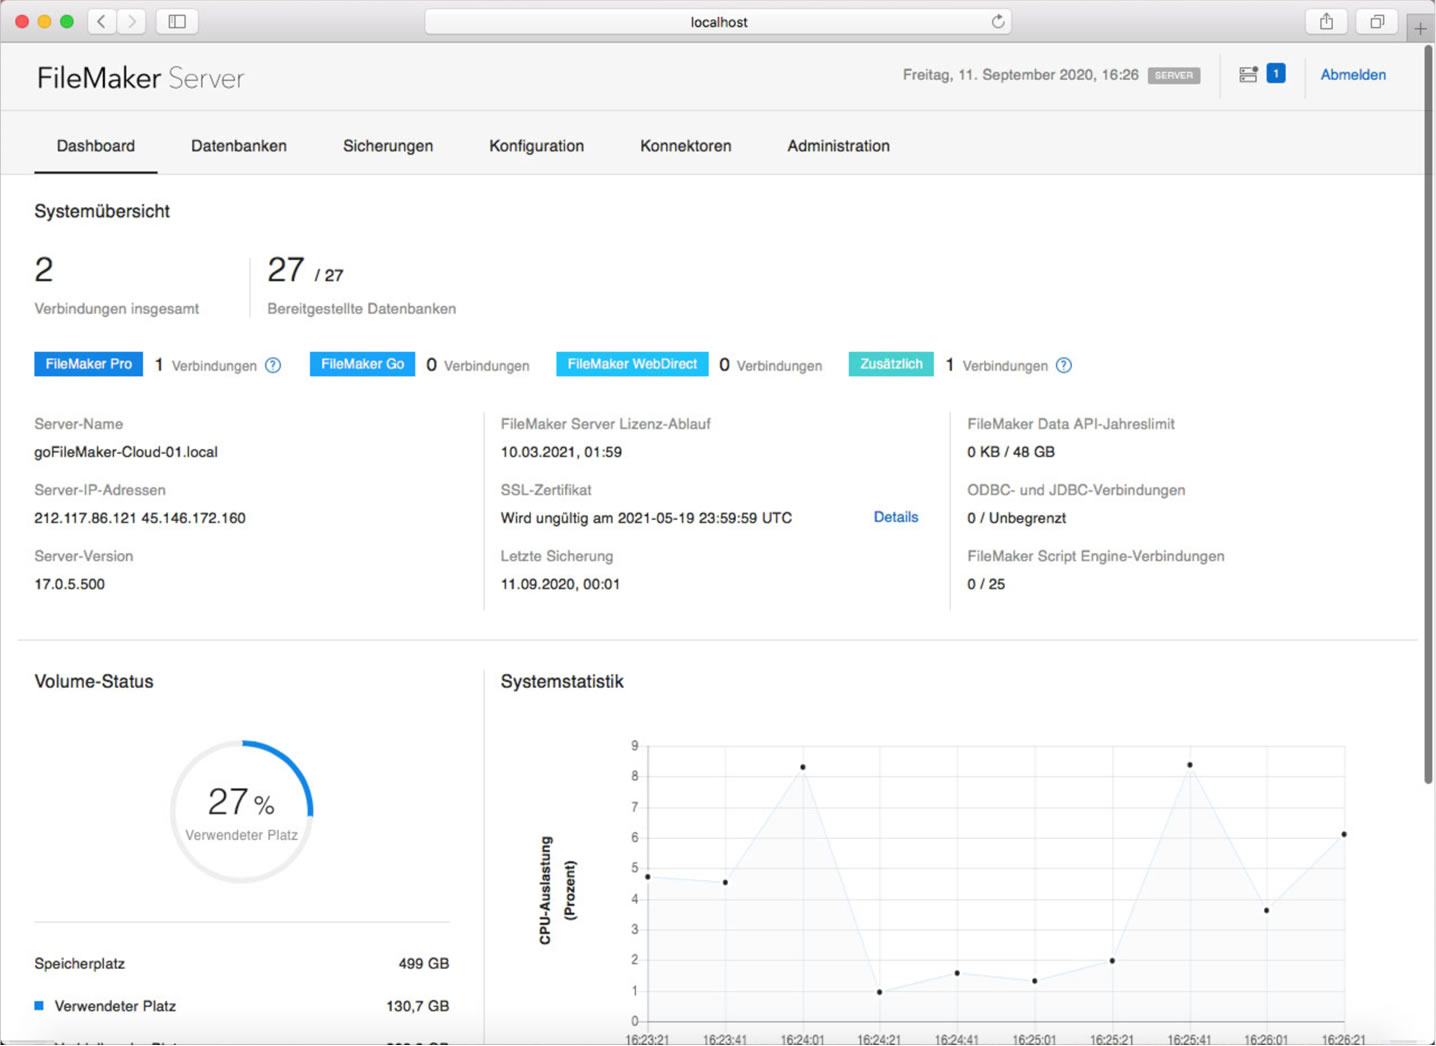 FileMaker Server Admin Konsole